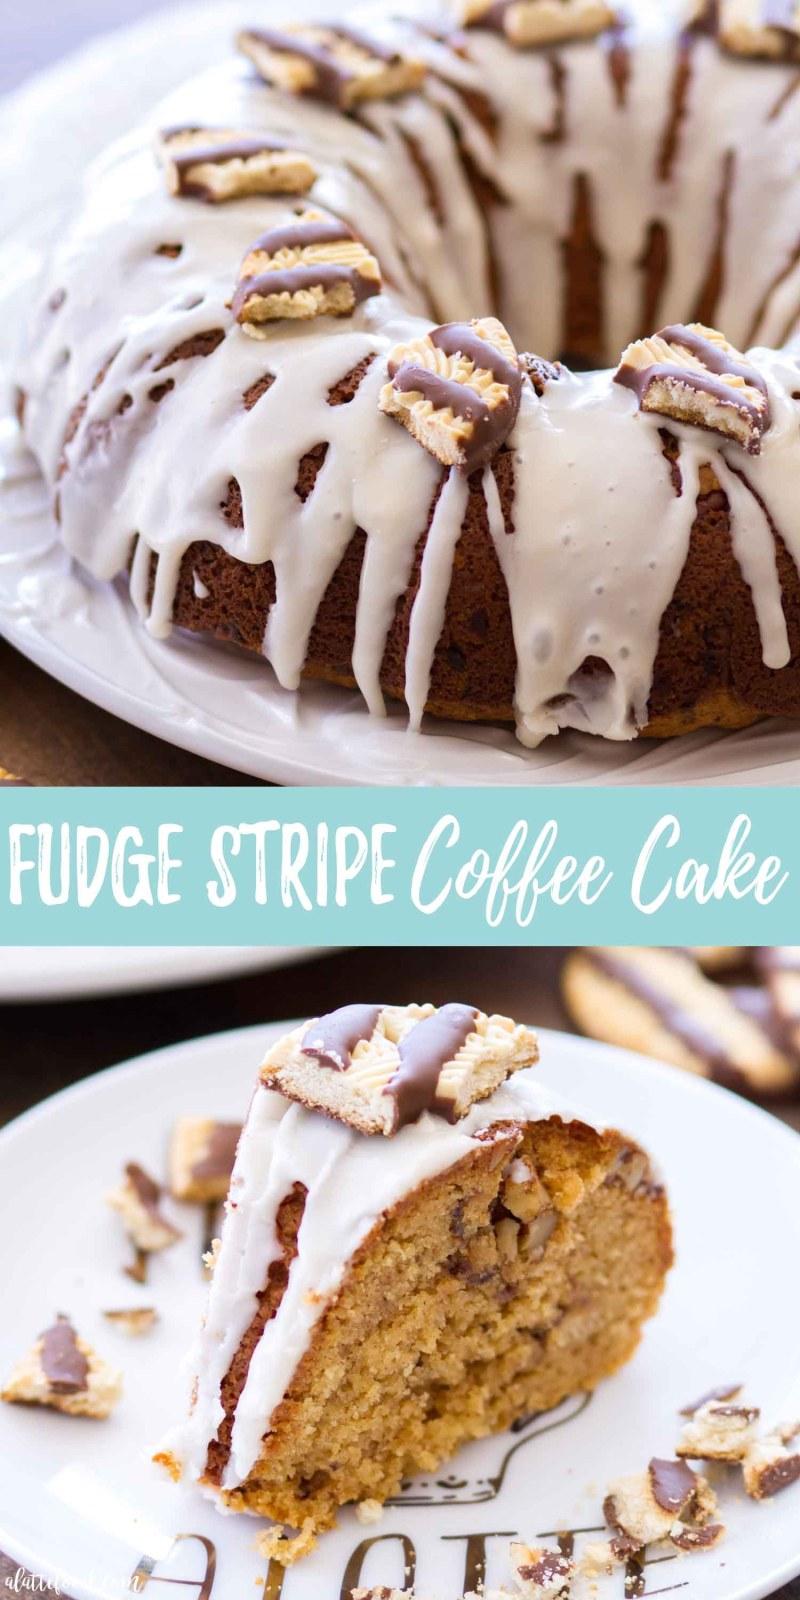 The best holiday dessert is this Fudge Stripe Coffee Cake Bundt Cake Recipe with a Vanilla Glaze